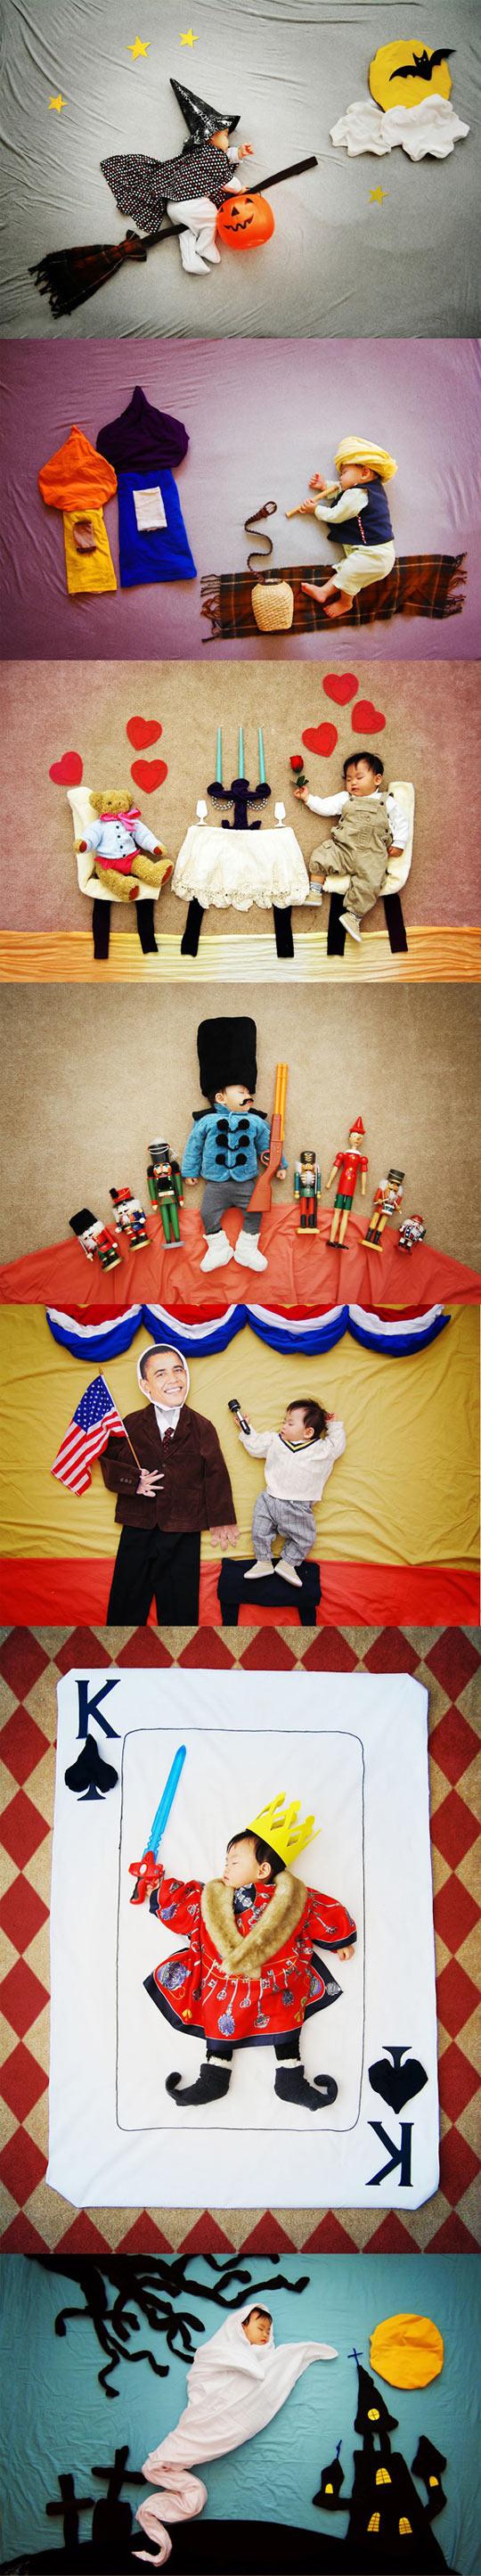 funny-baby-nap-art-photography